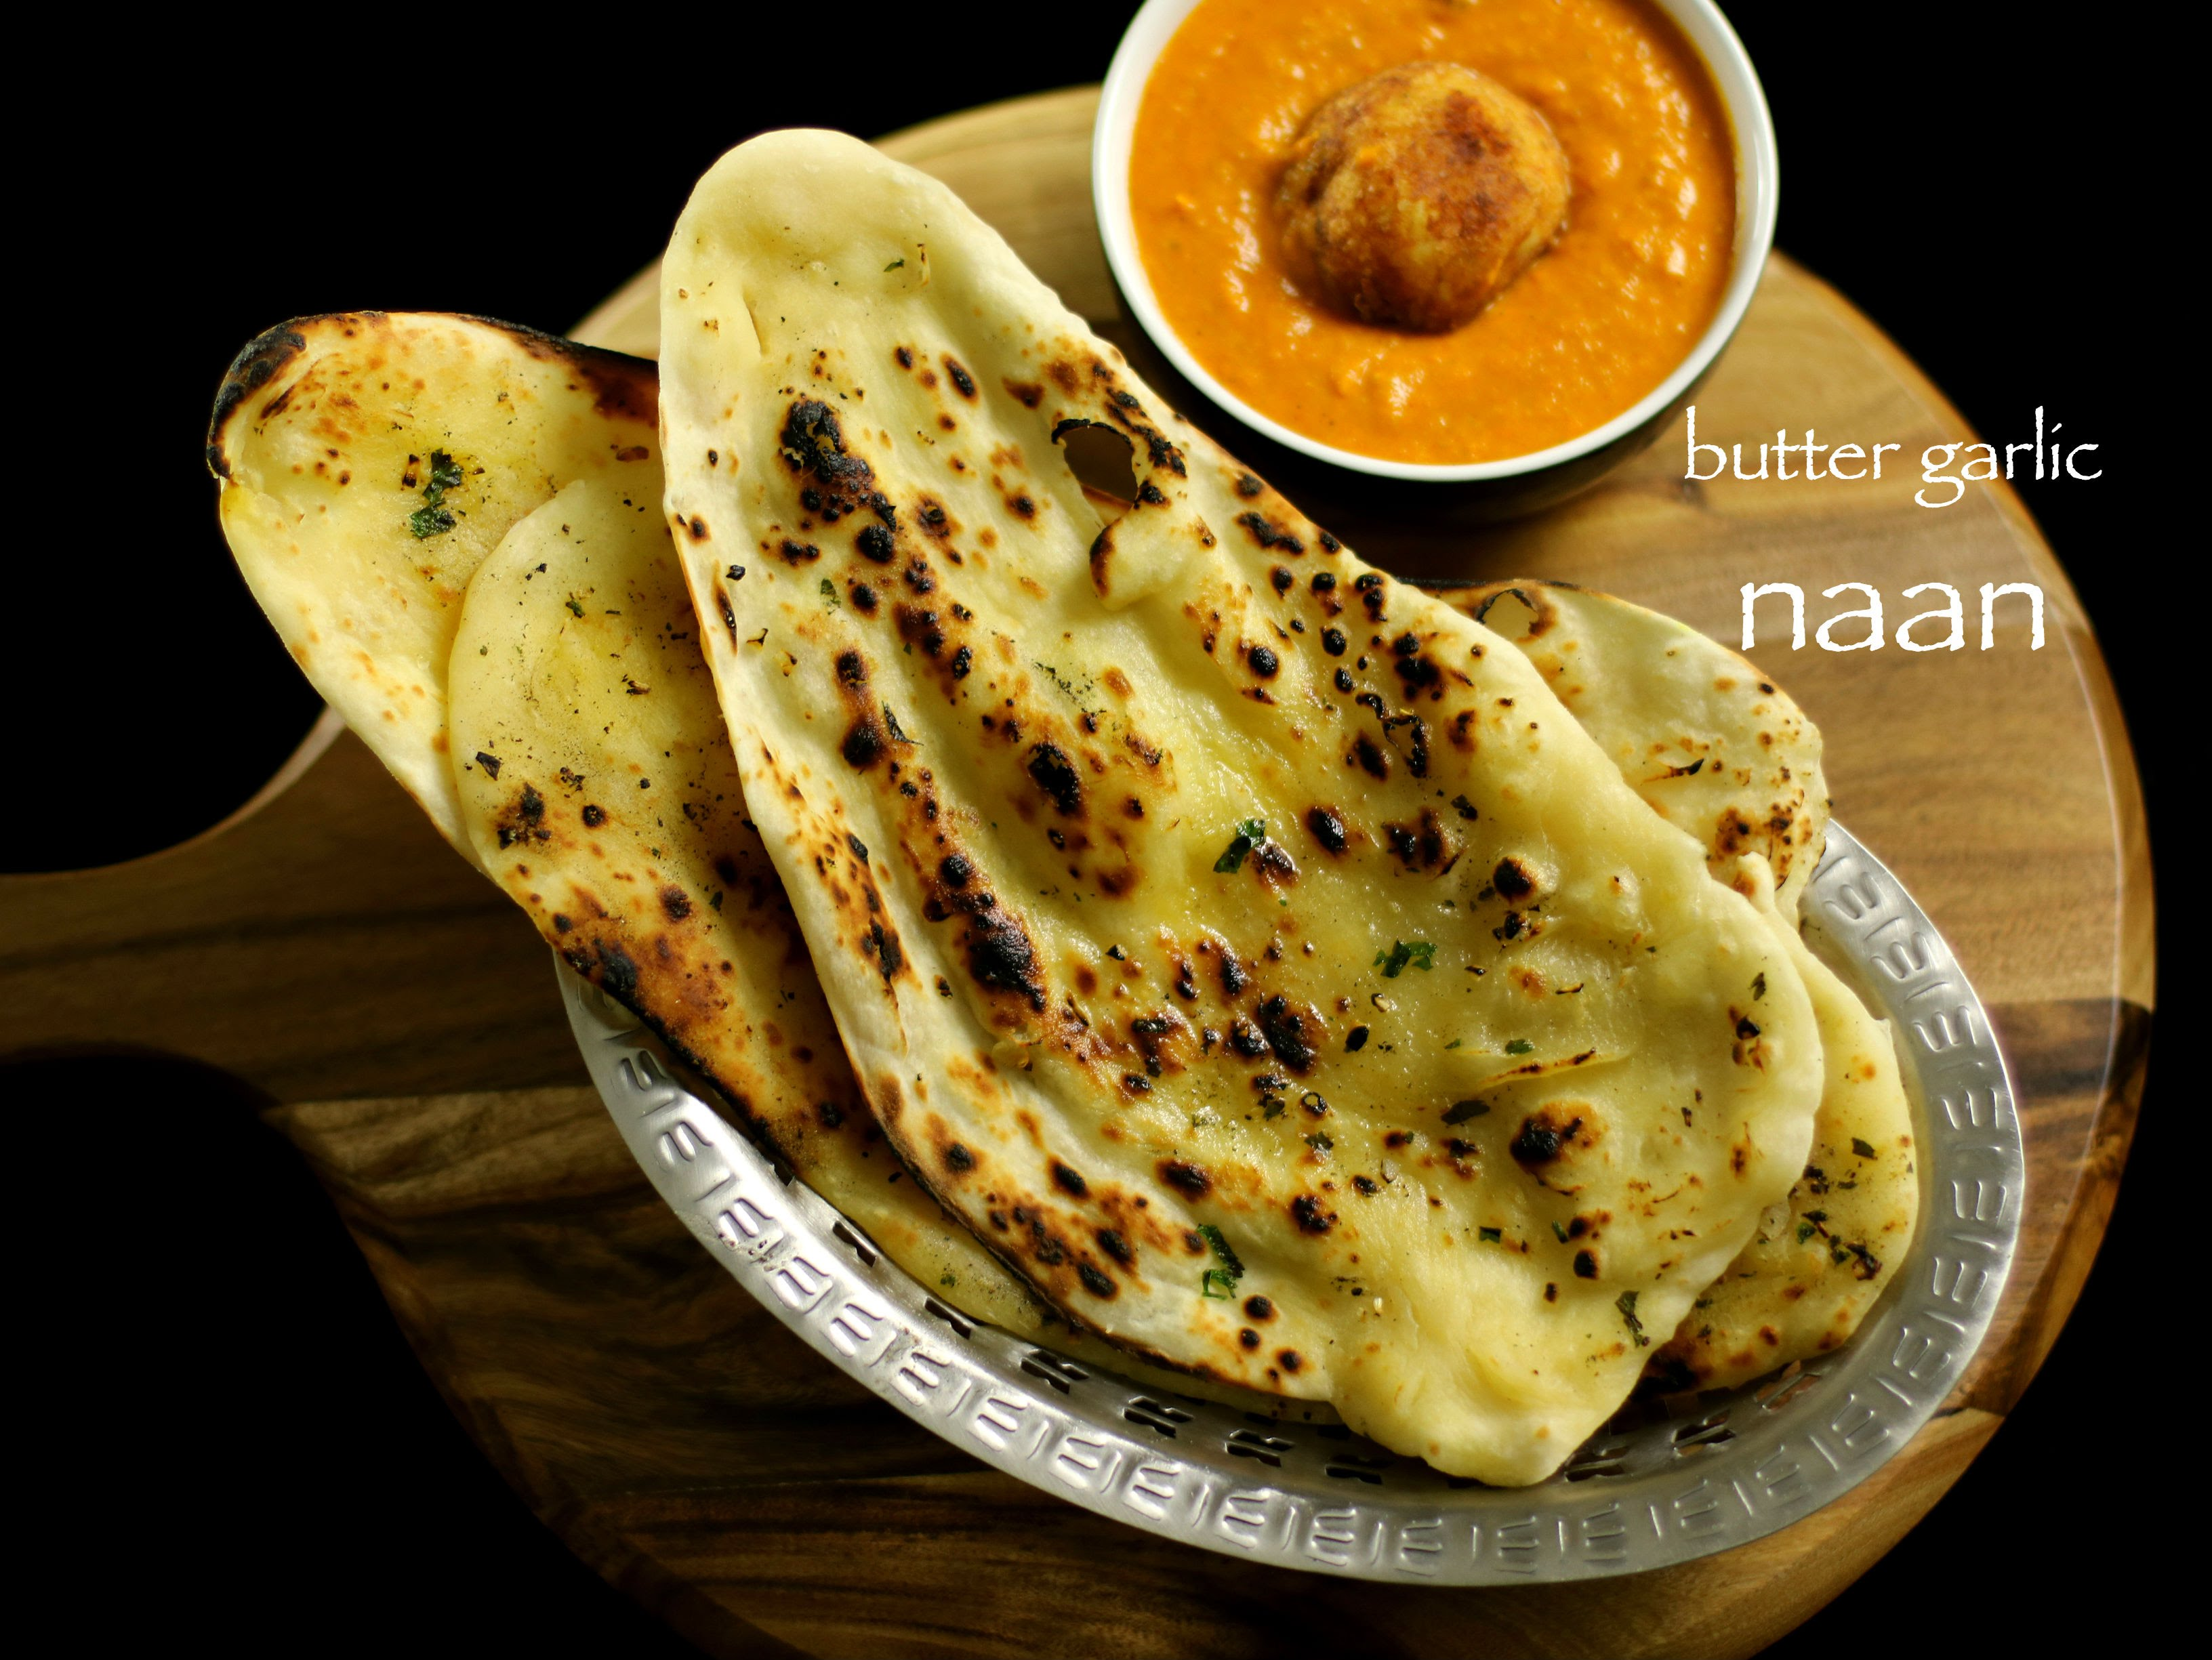 Garlic Butter Naan Recipe On Tawa Stove Top Cookeryshow Com